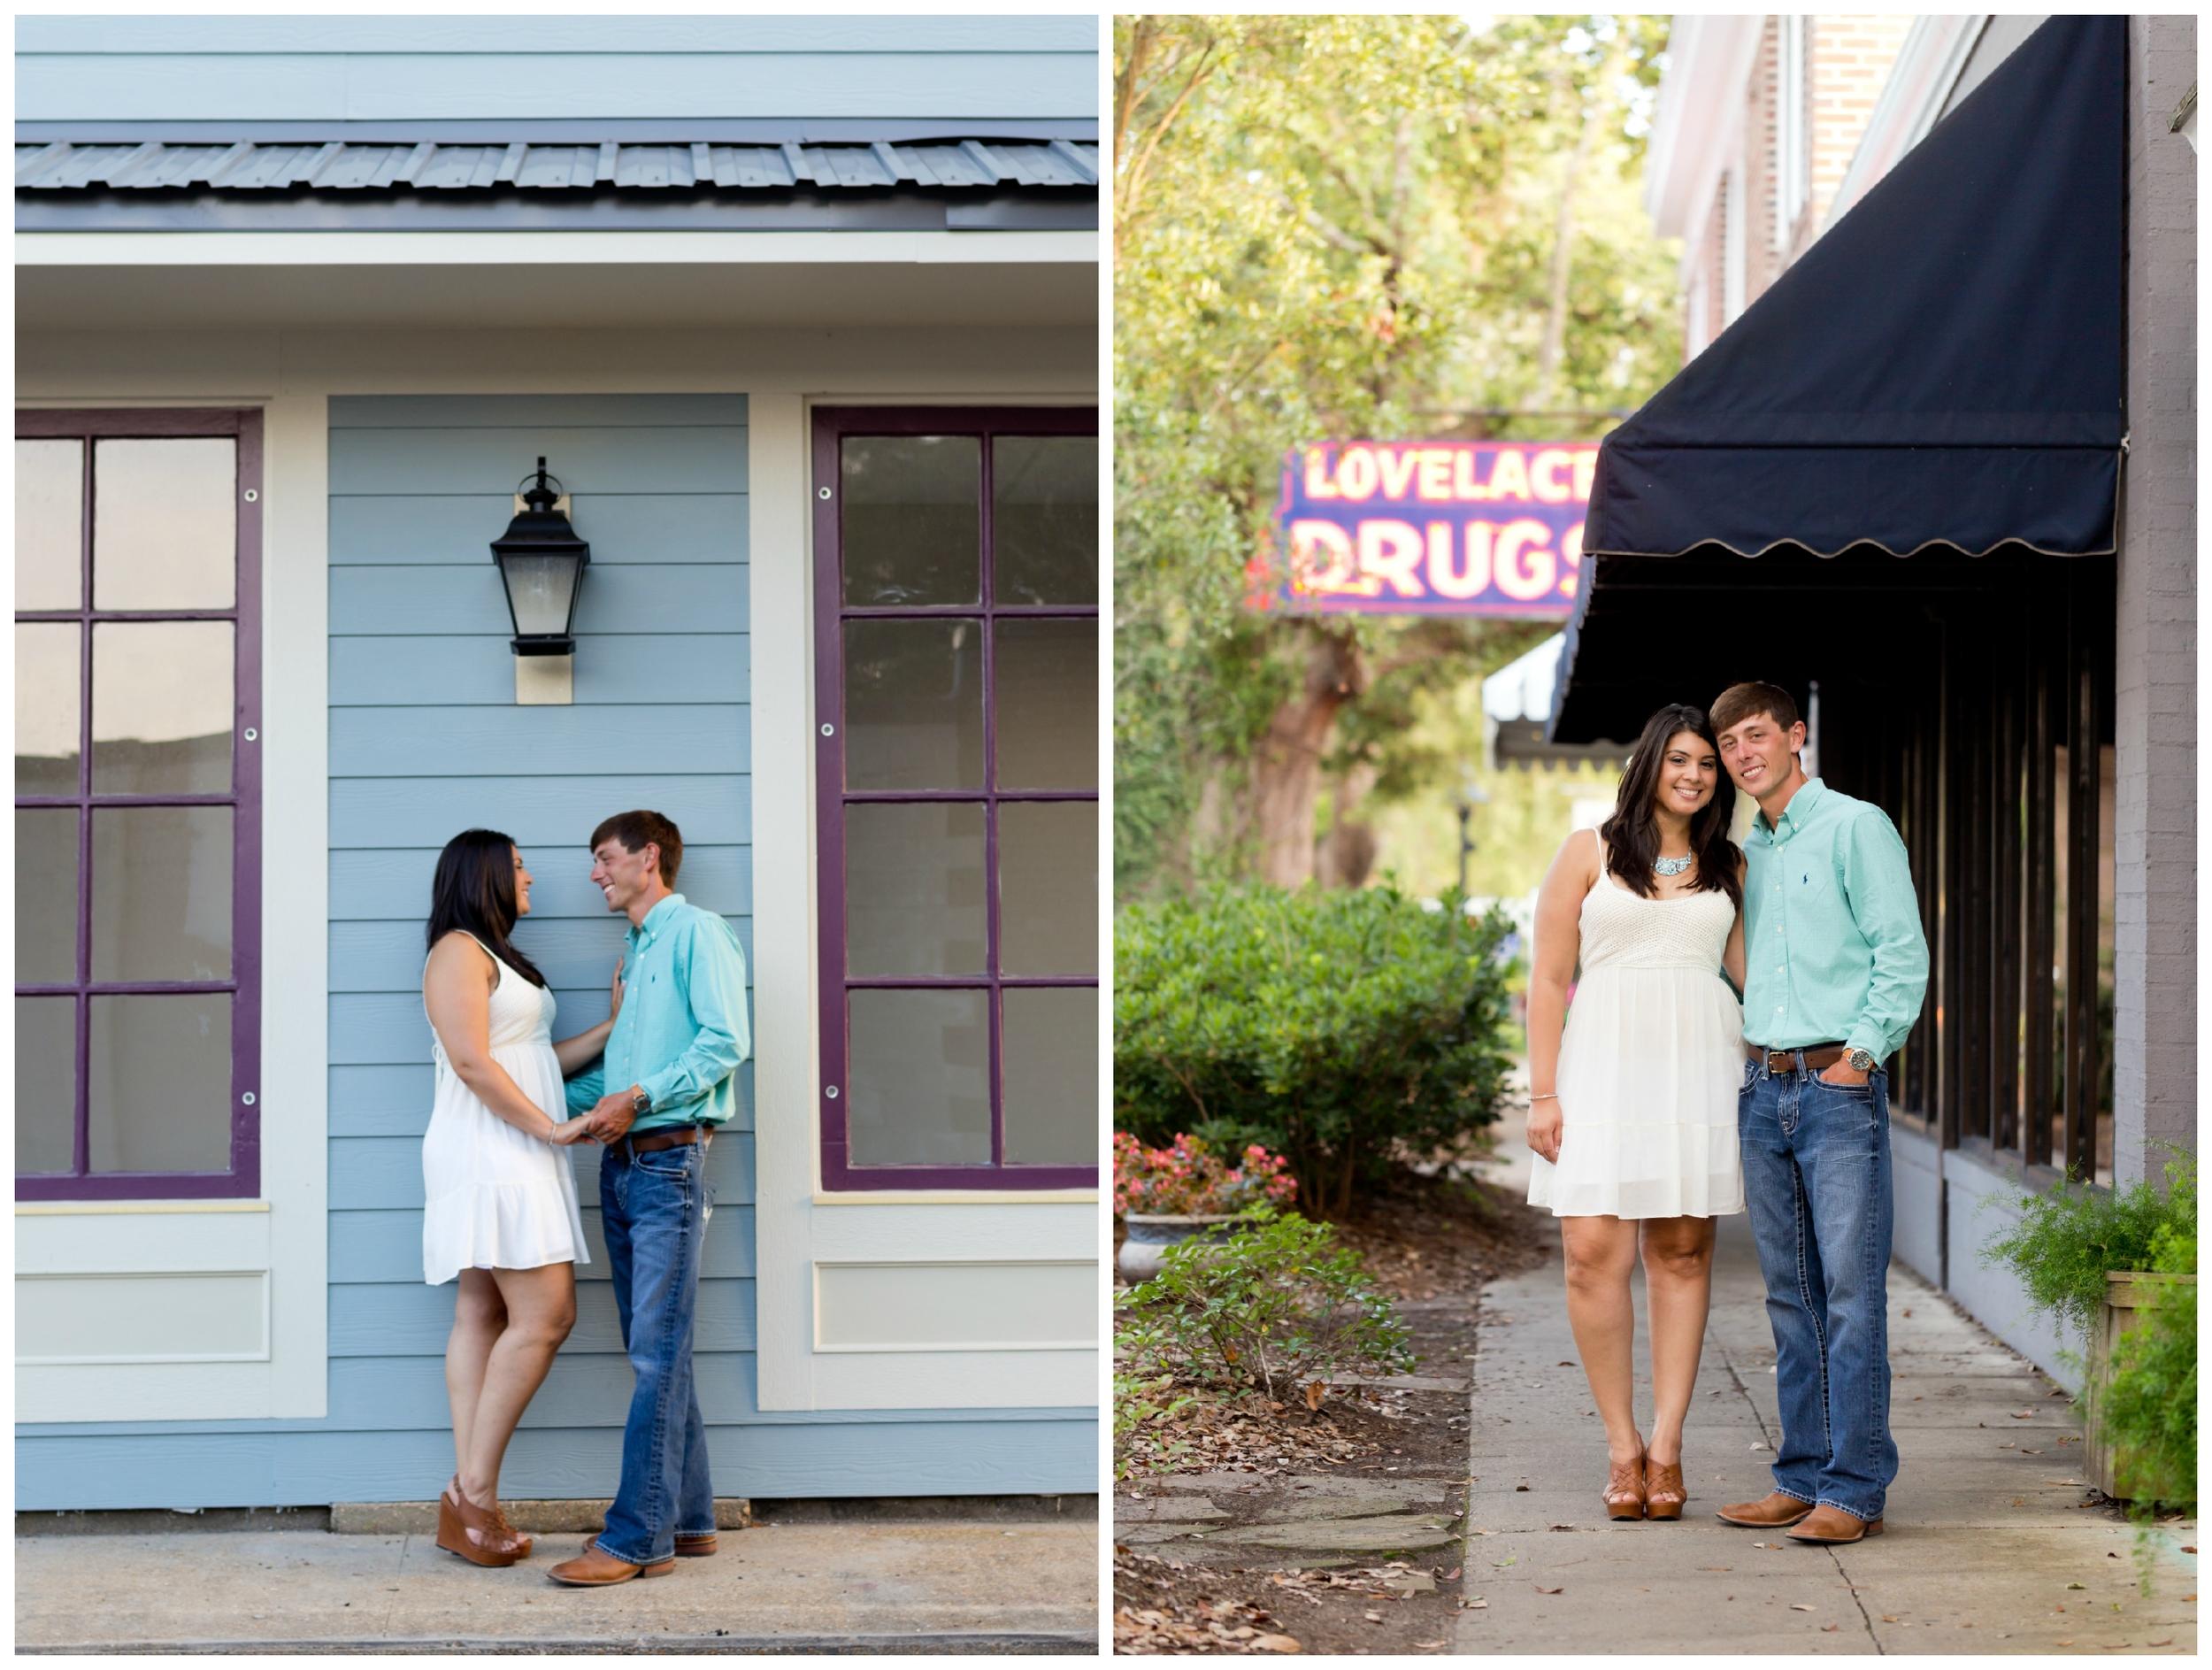 Ocean Springs, Mississippi engagement photographs